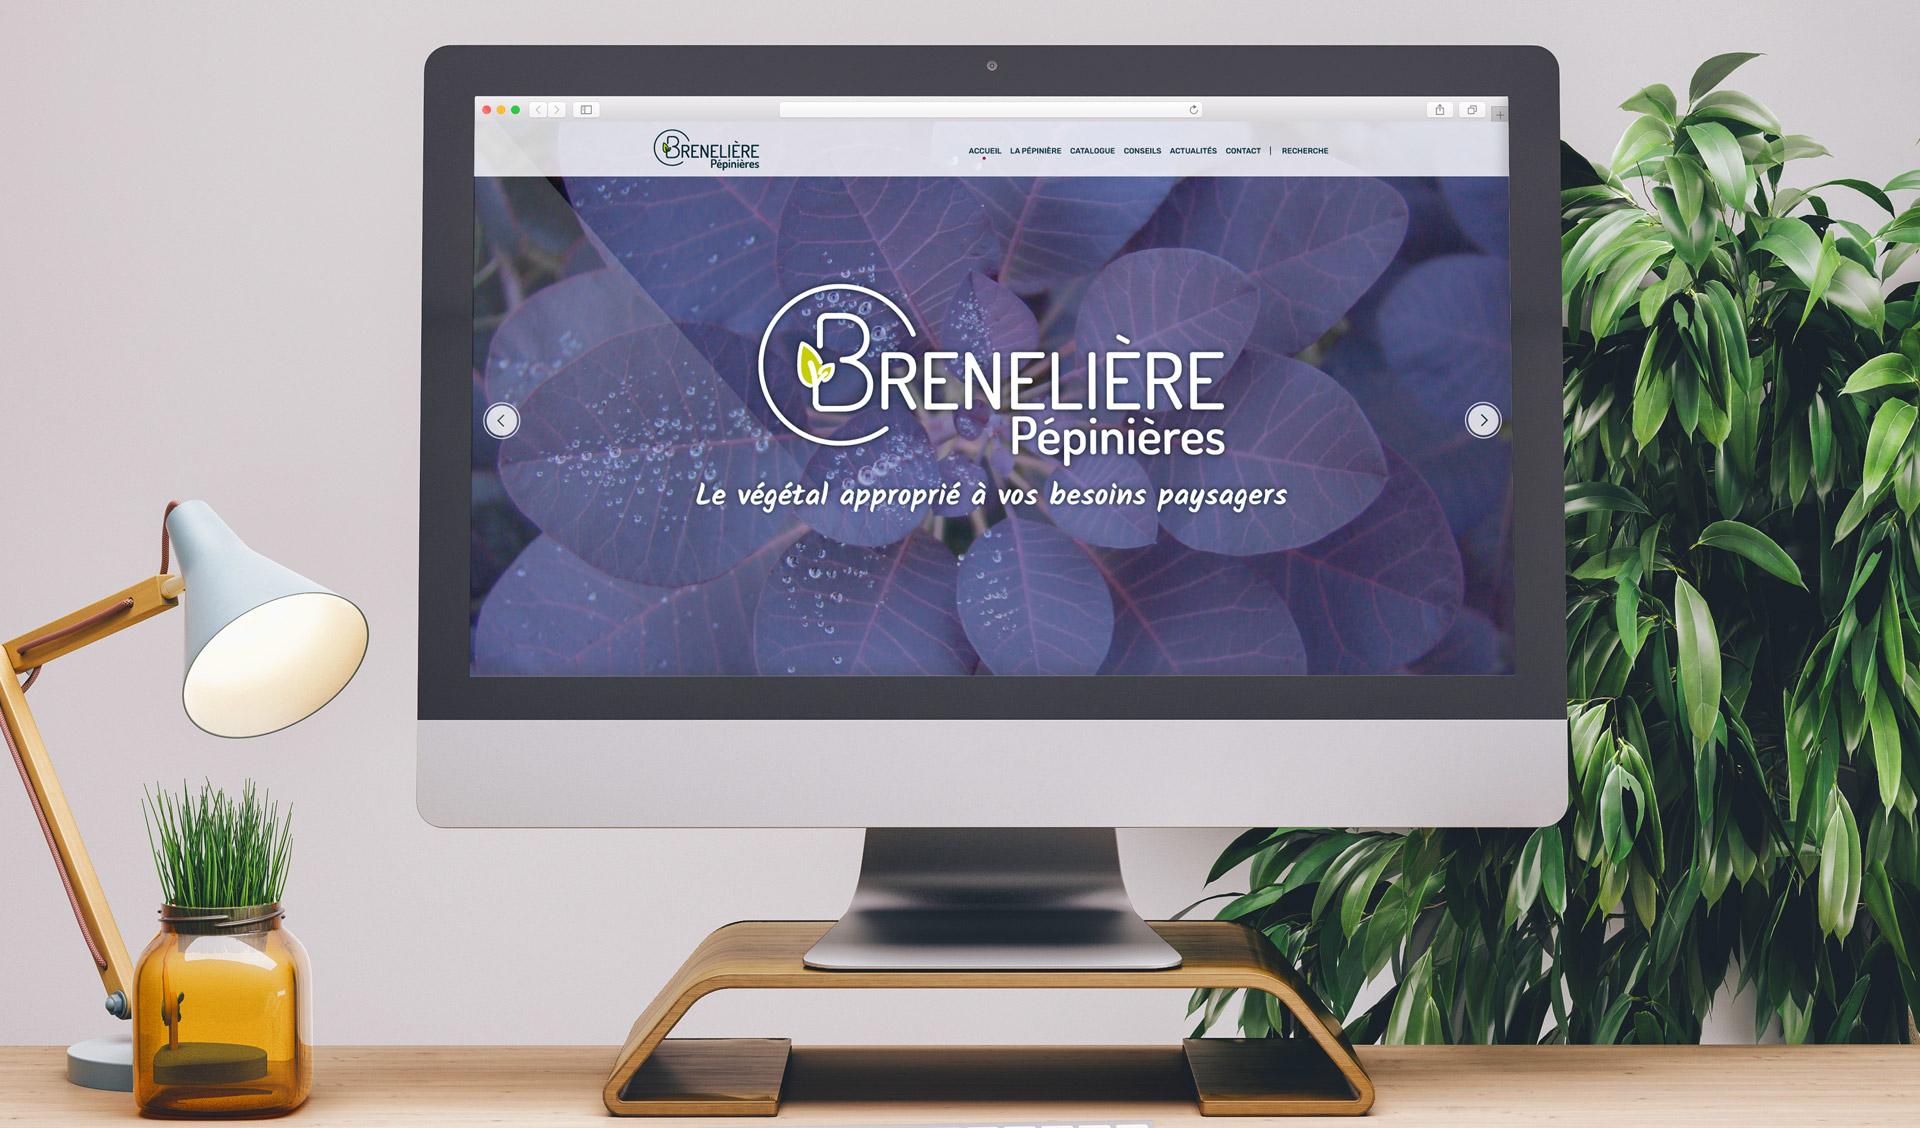 Pepinière Brenelière site web